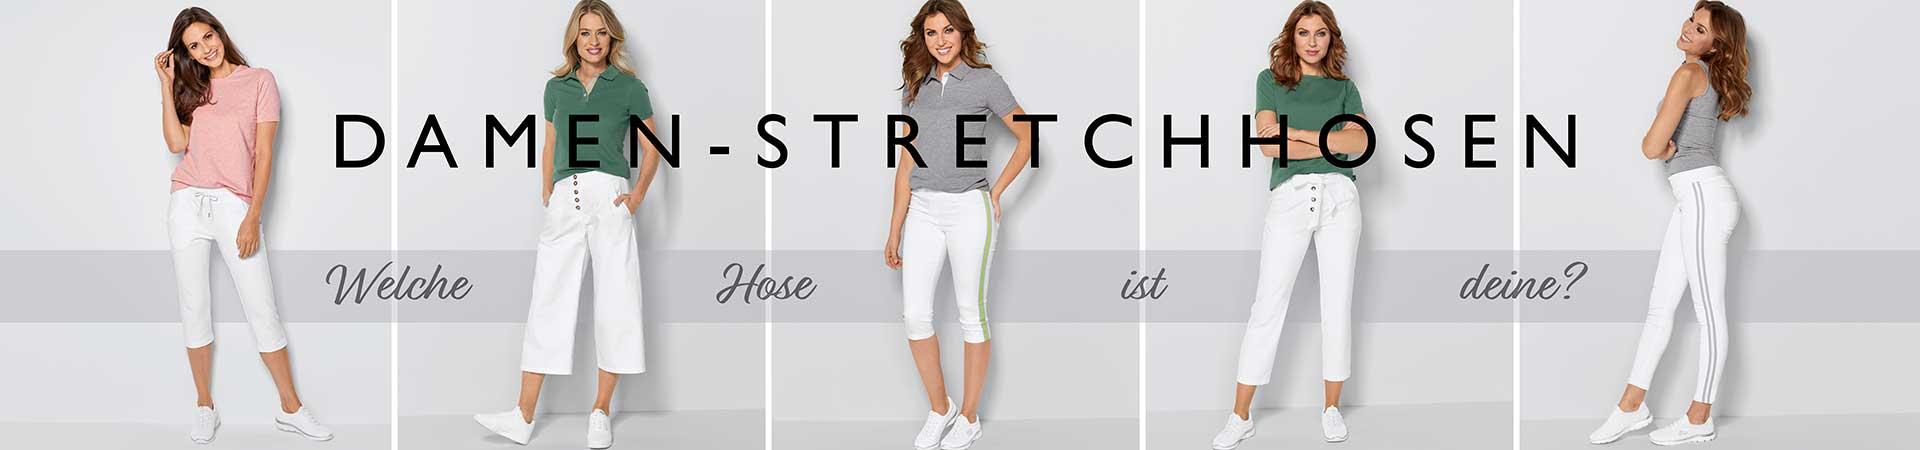 Damen-Stretchhosen